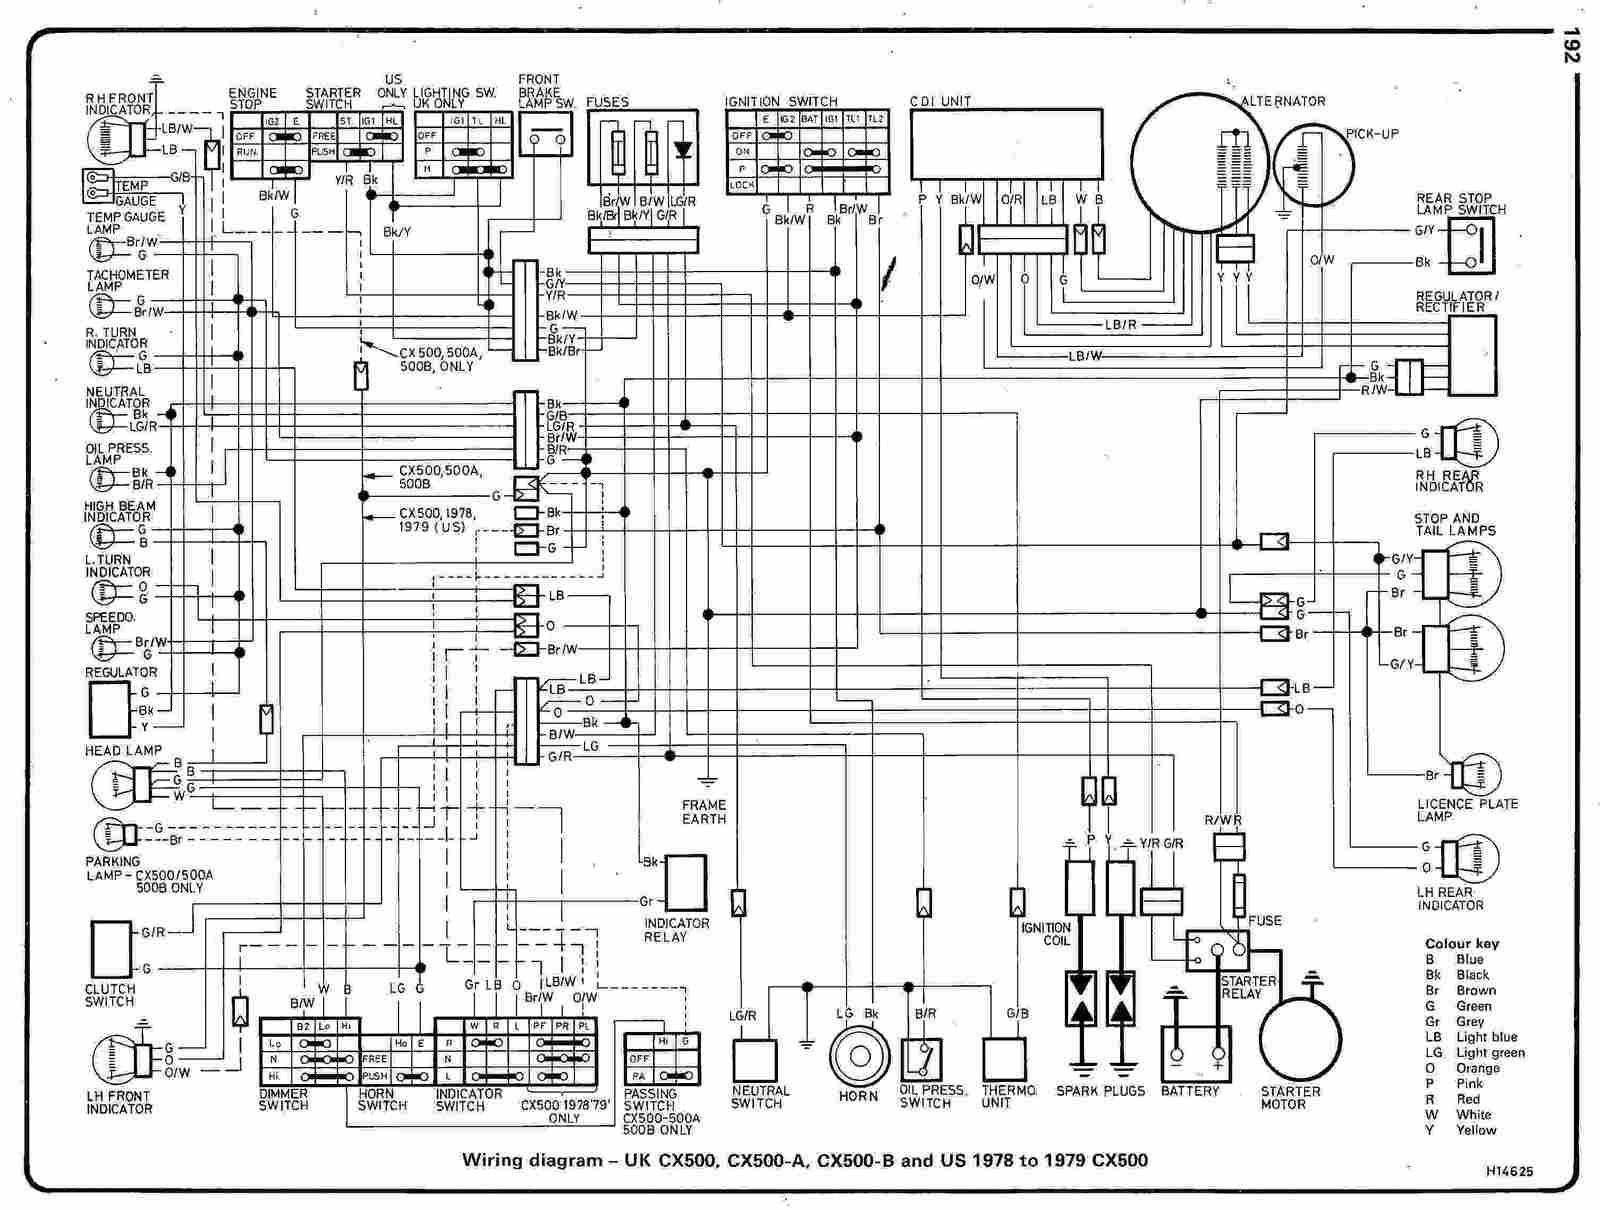 1979 dodge power wagon parts 1979 dodge d200 wiring diagram  [ 1600 x 1210 Pixel ]